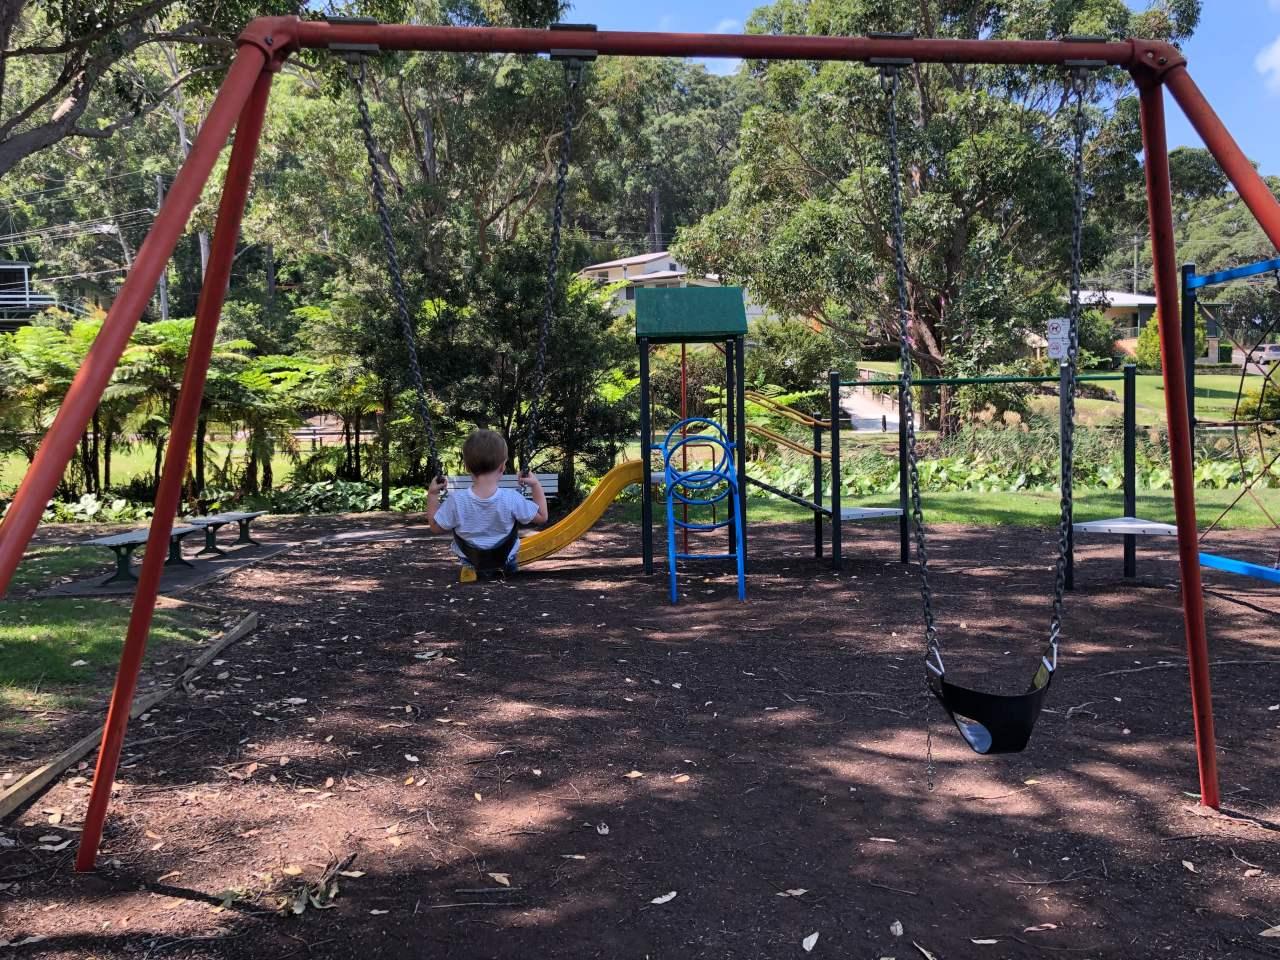 Seabrook Reserve playground, Tascott